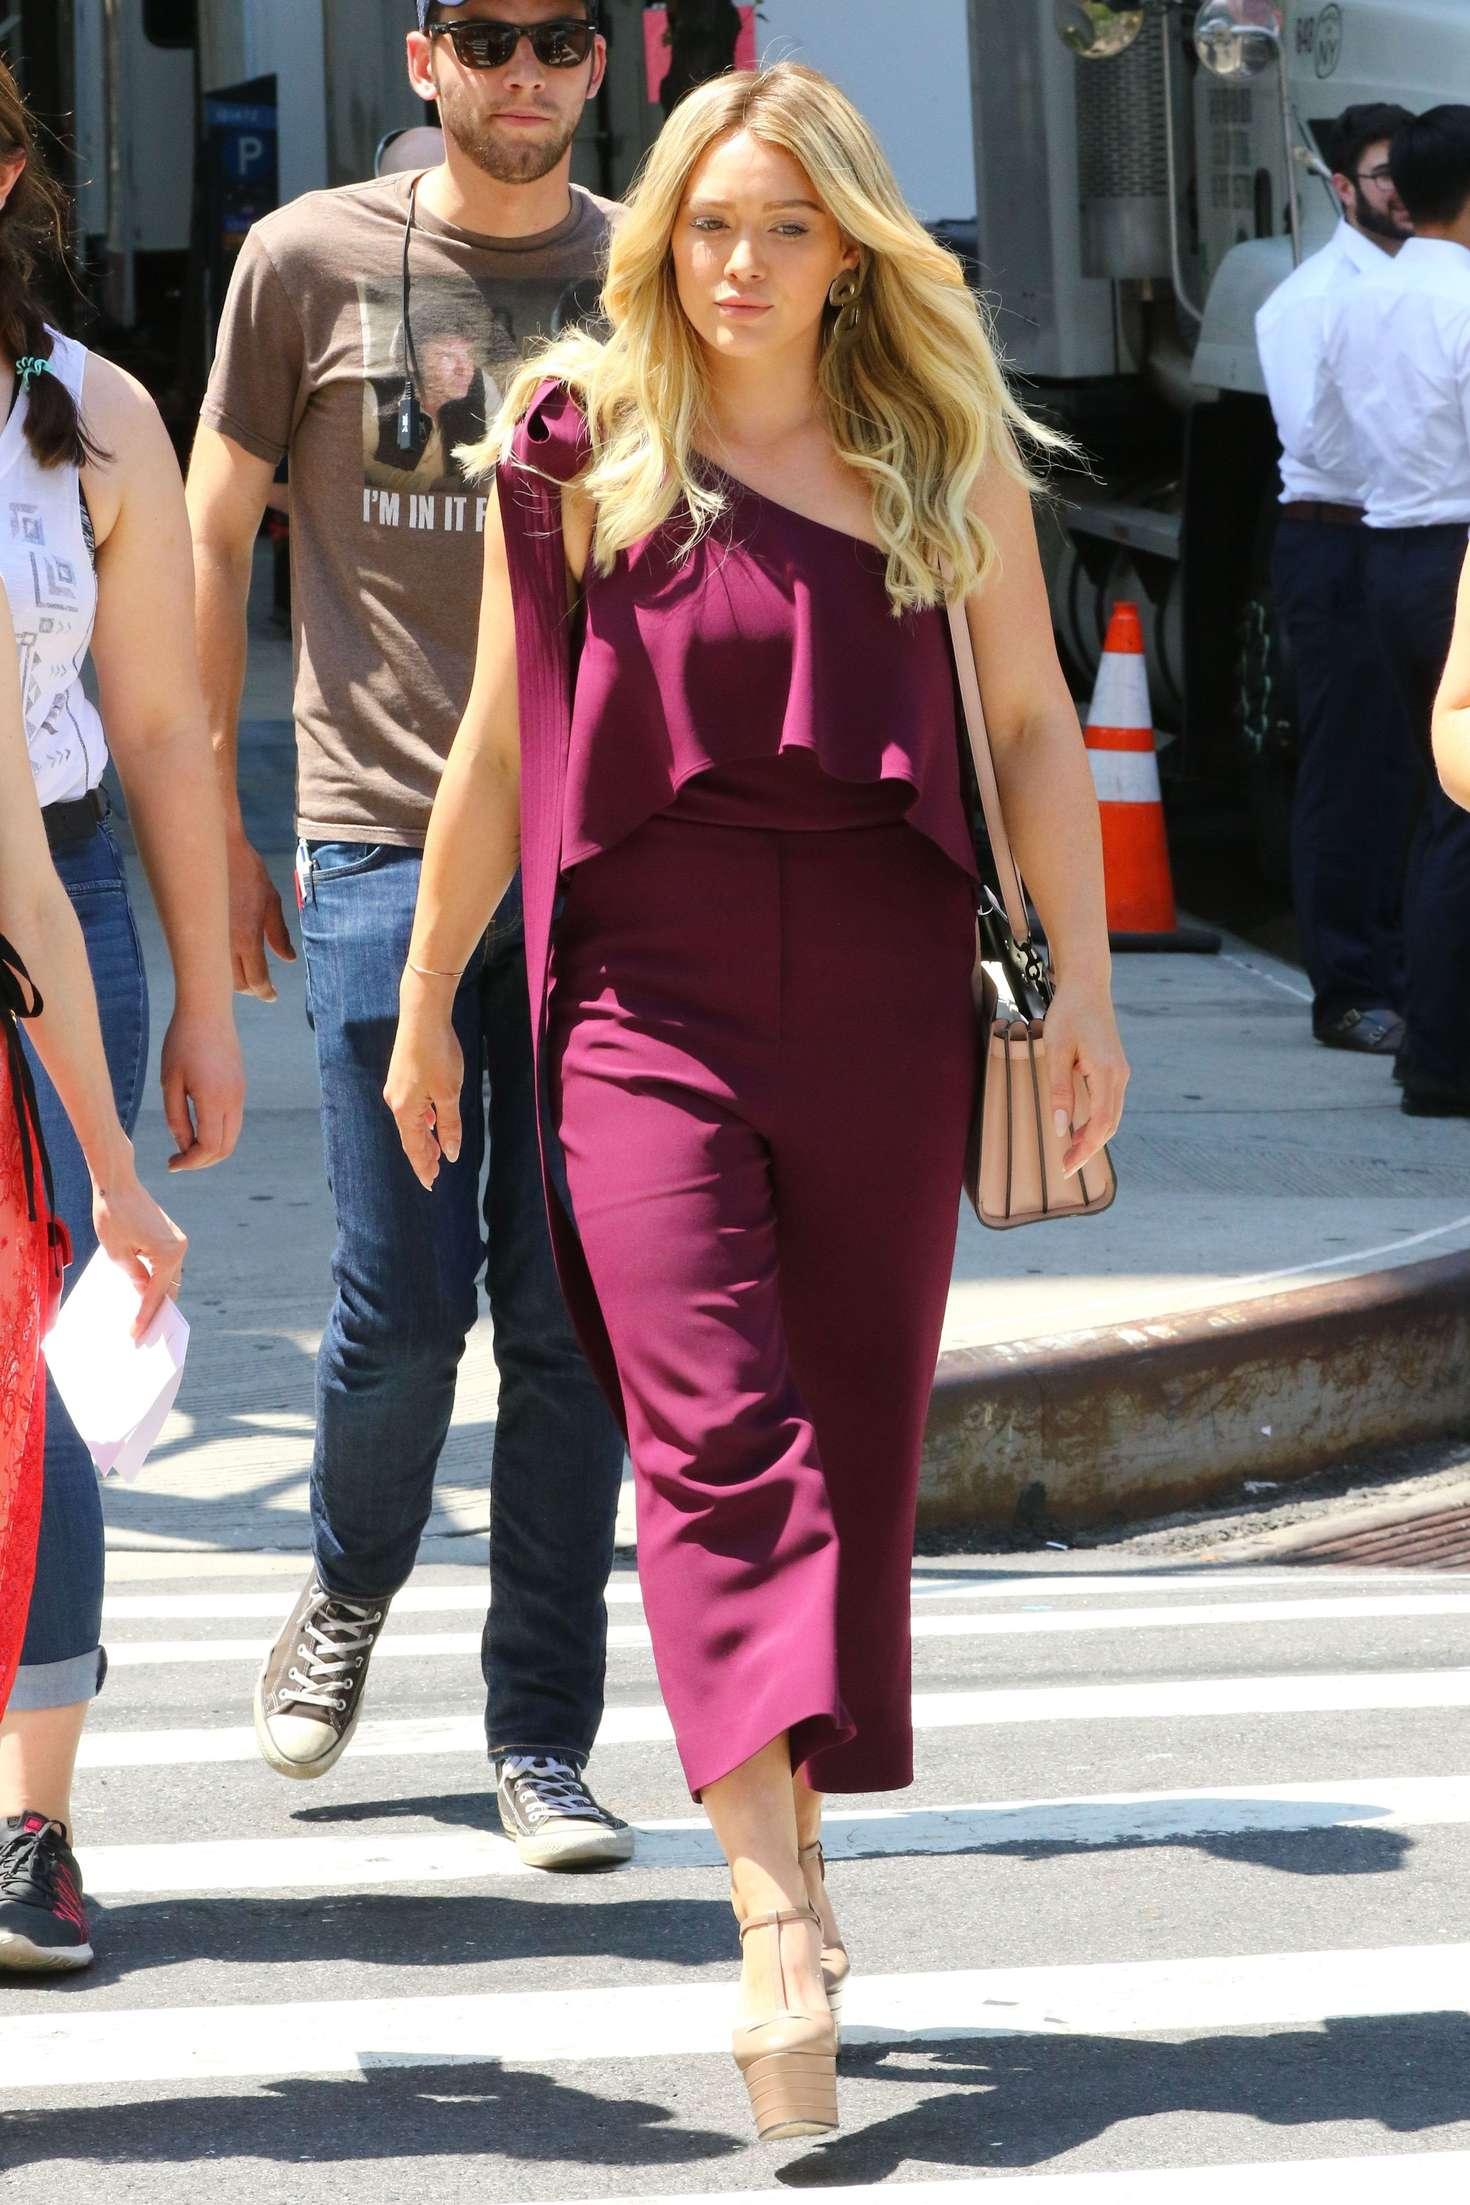 Hilary Duff 2017 : Hilary Duff on Younger Set -01